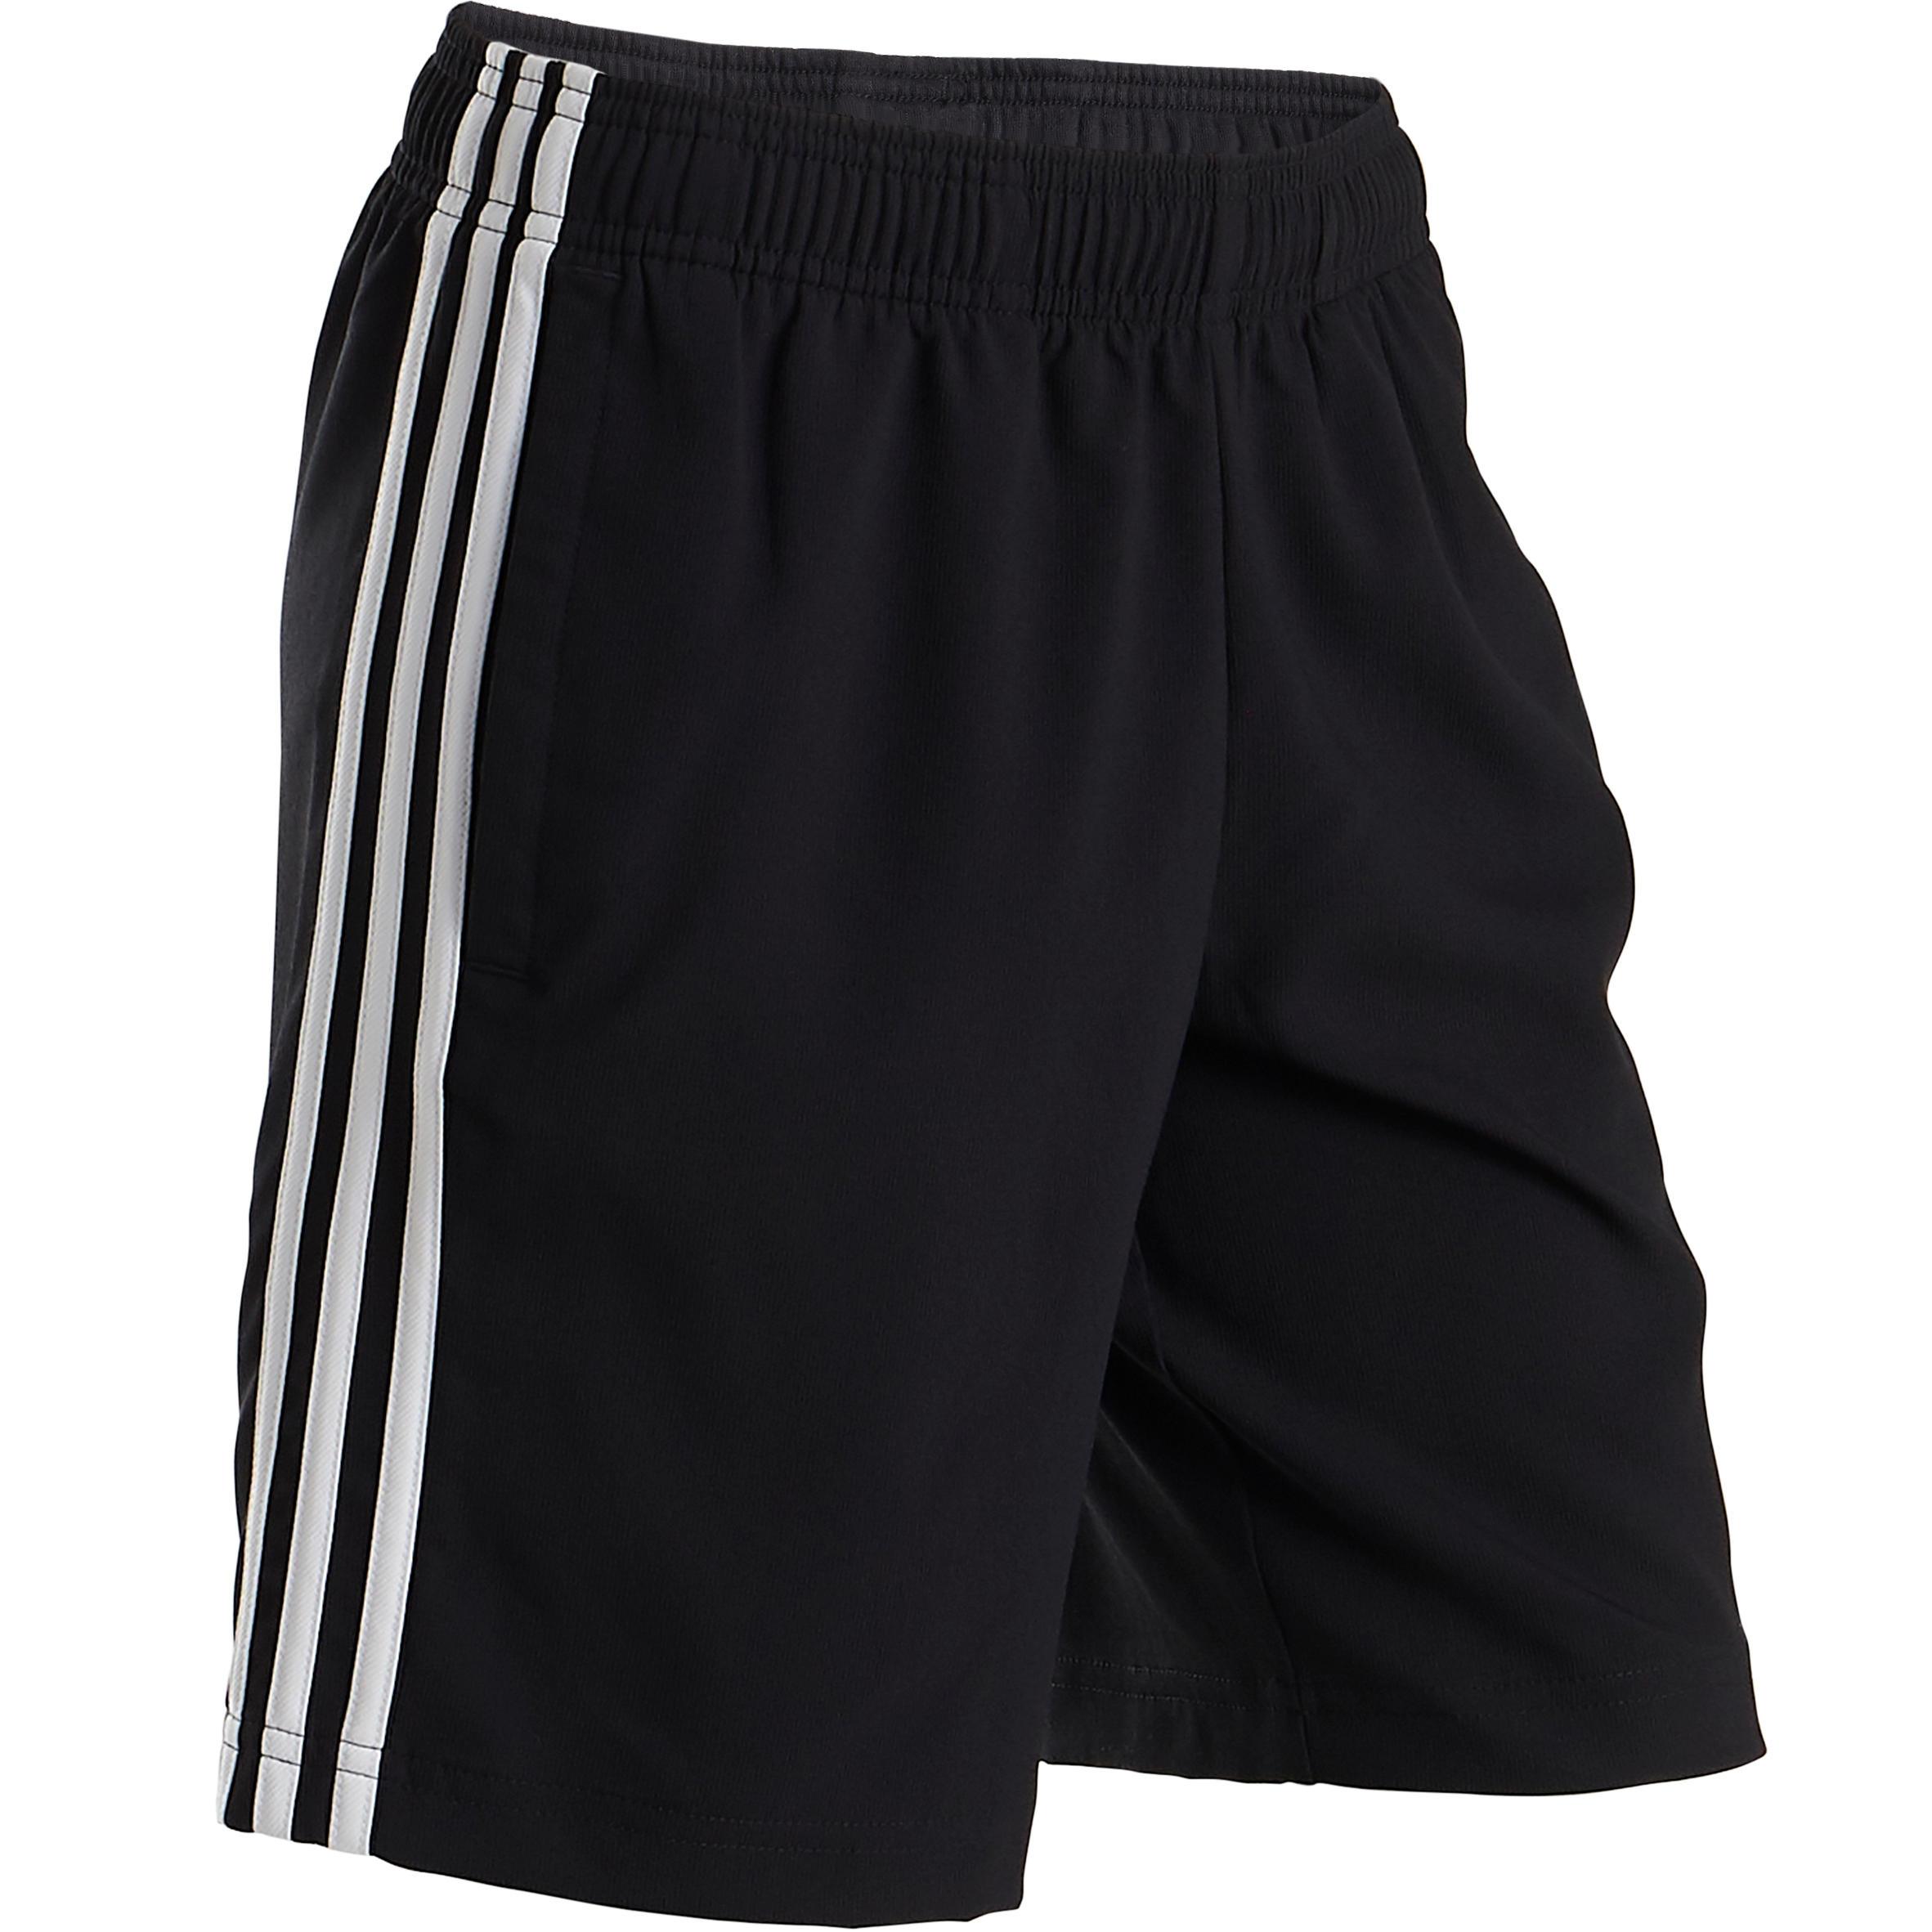 pantaloni adidas ragazzo 13 anni